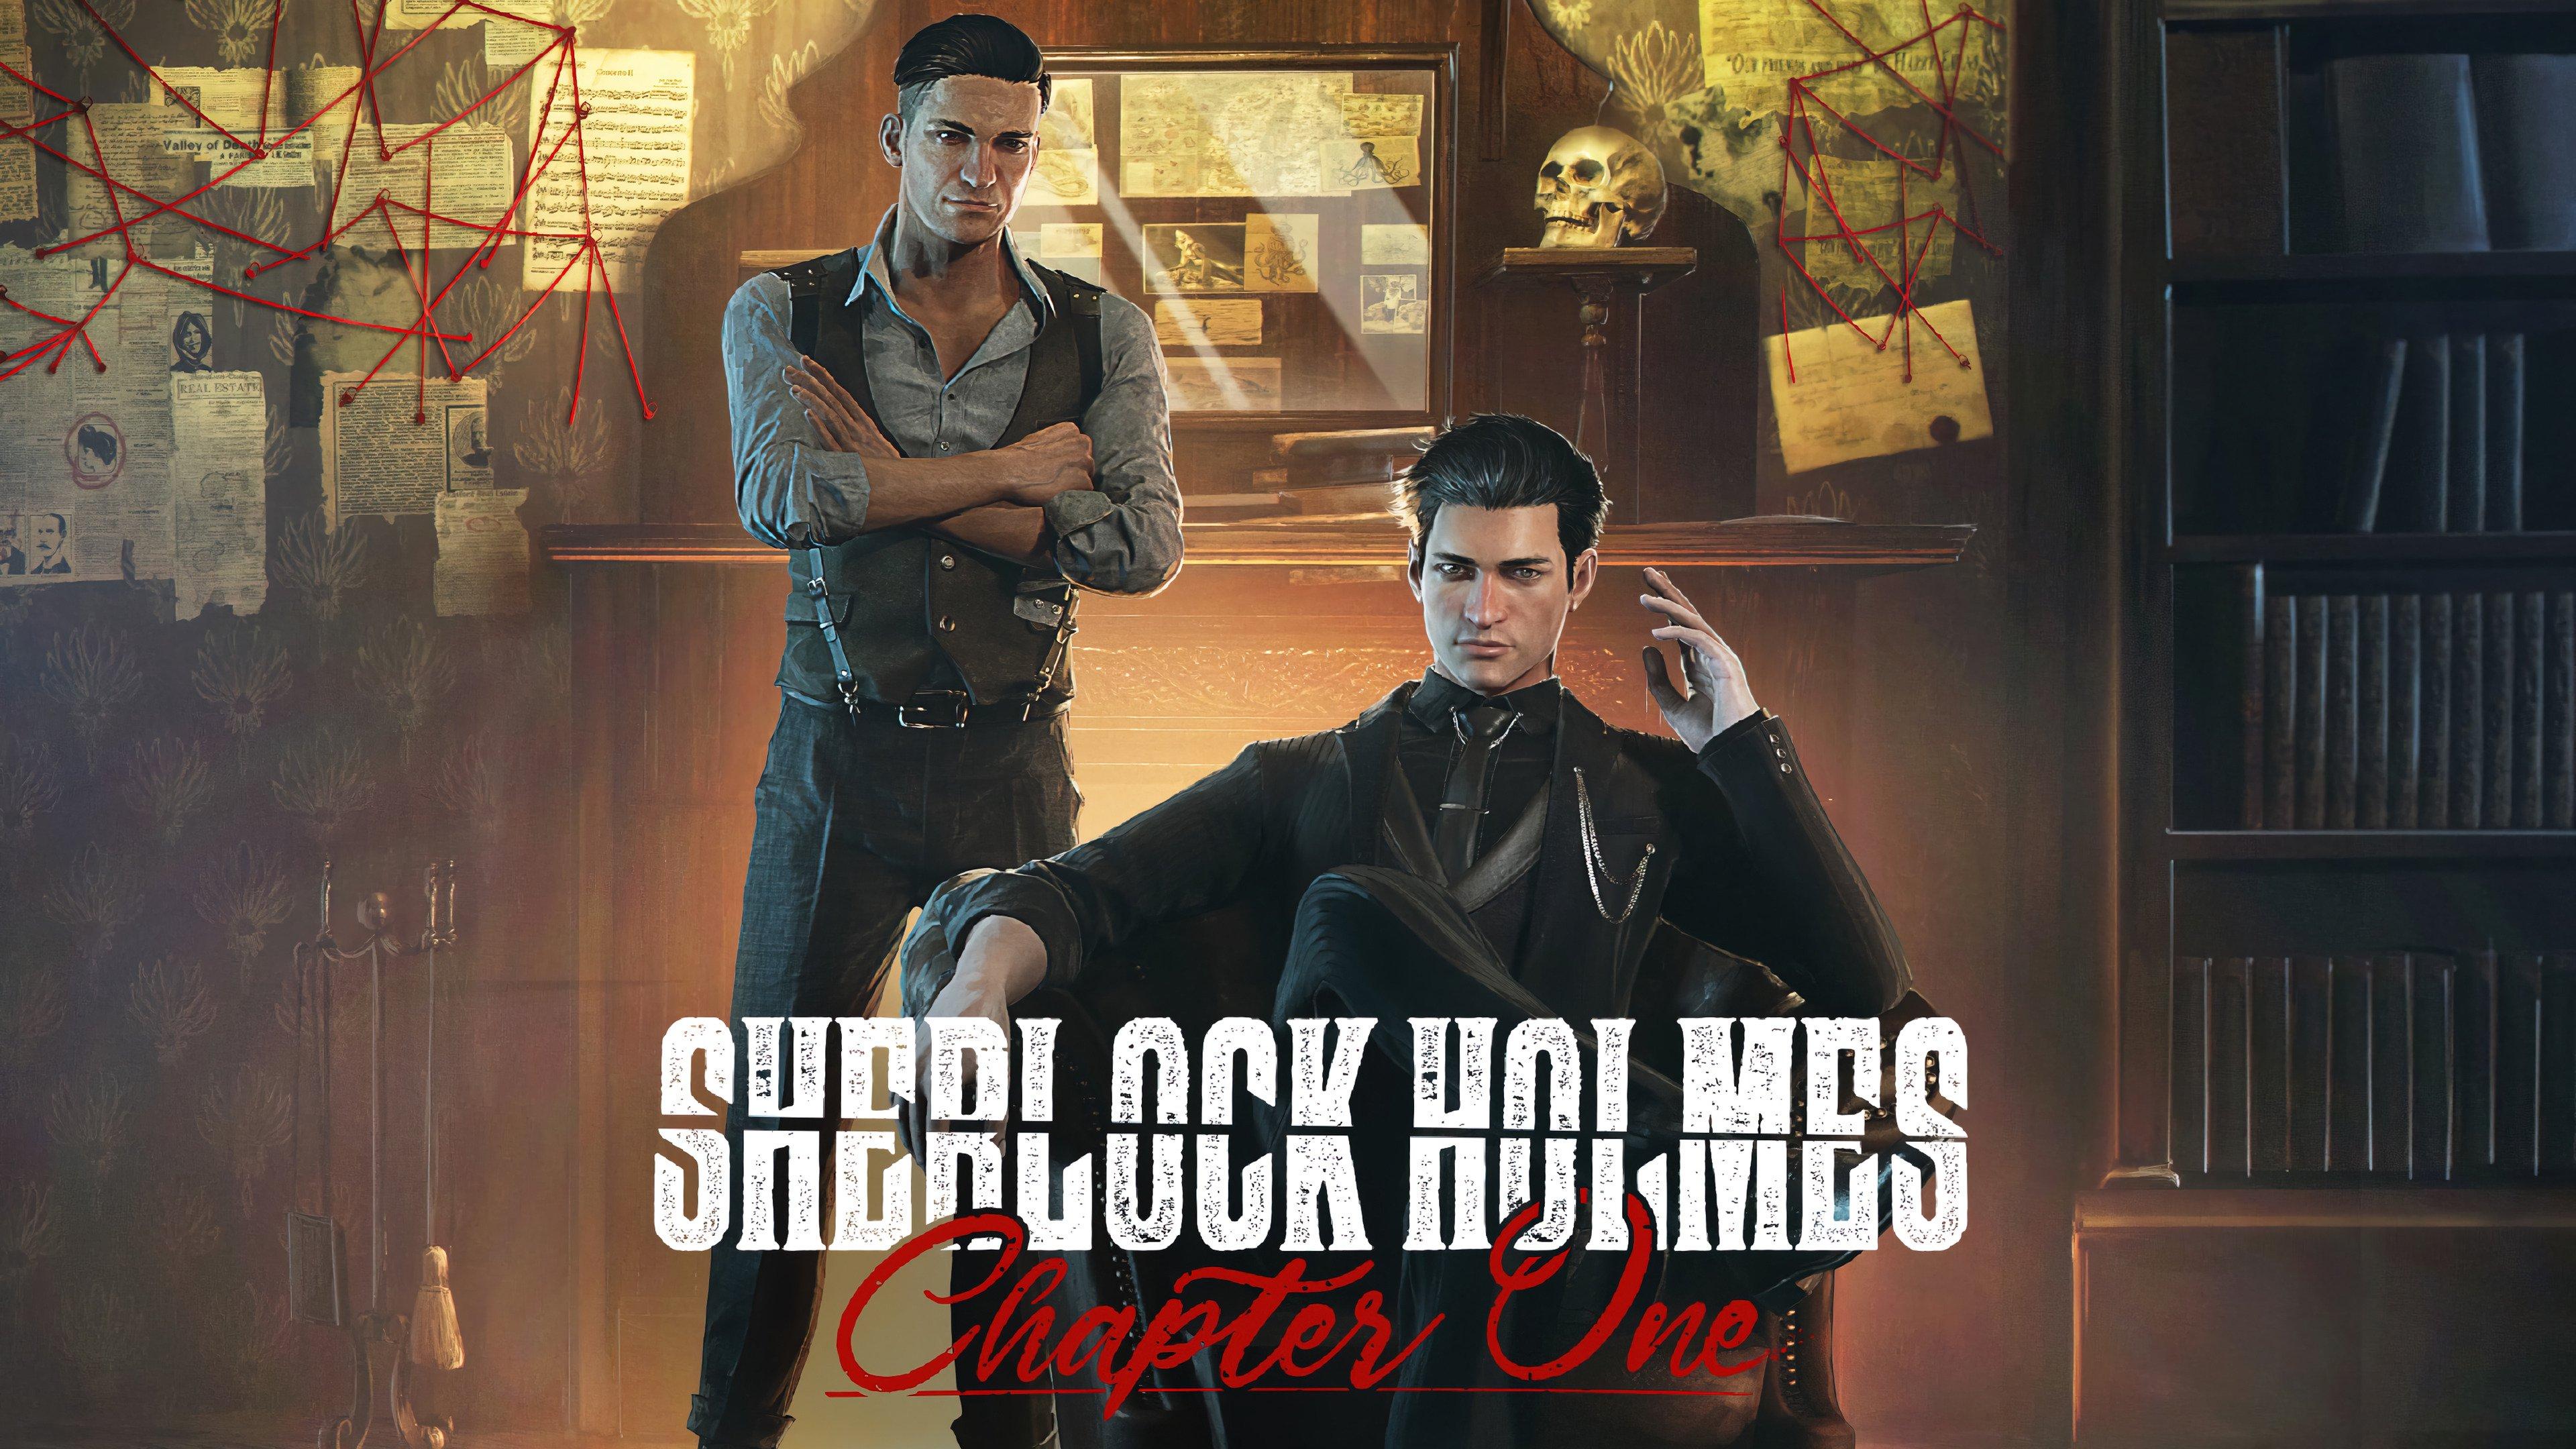 Fondos de pantalla Sherlock Holmes Chapter One